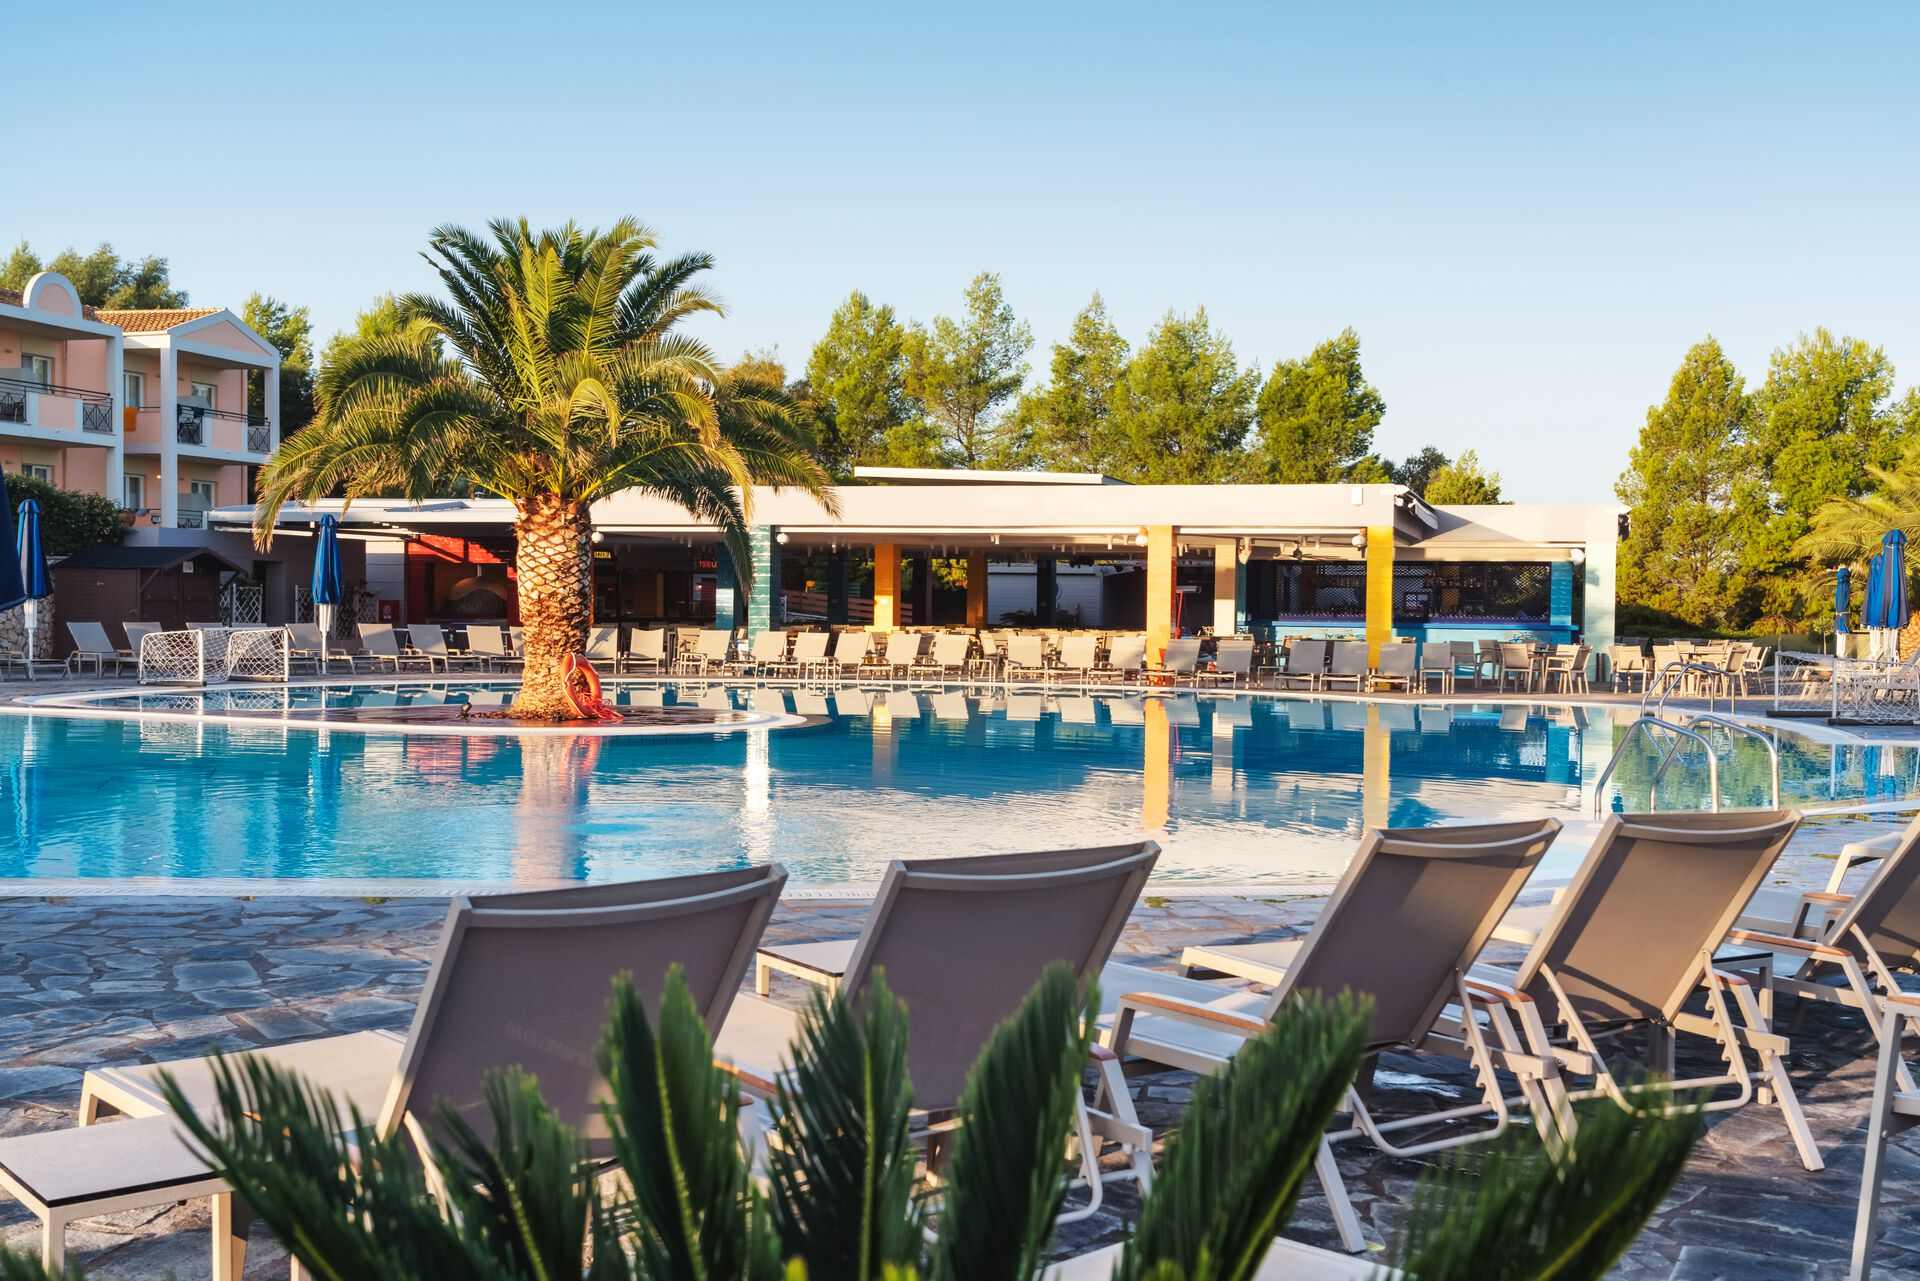 Grèce - Iles grecques - Corfou - Hôtel Mareblue Beach Corfu 4*